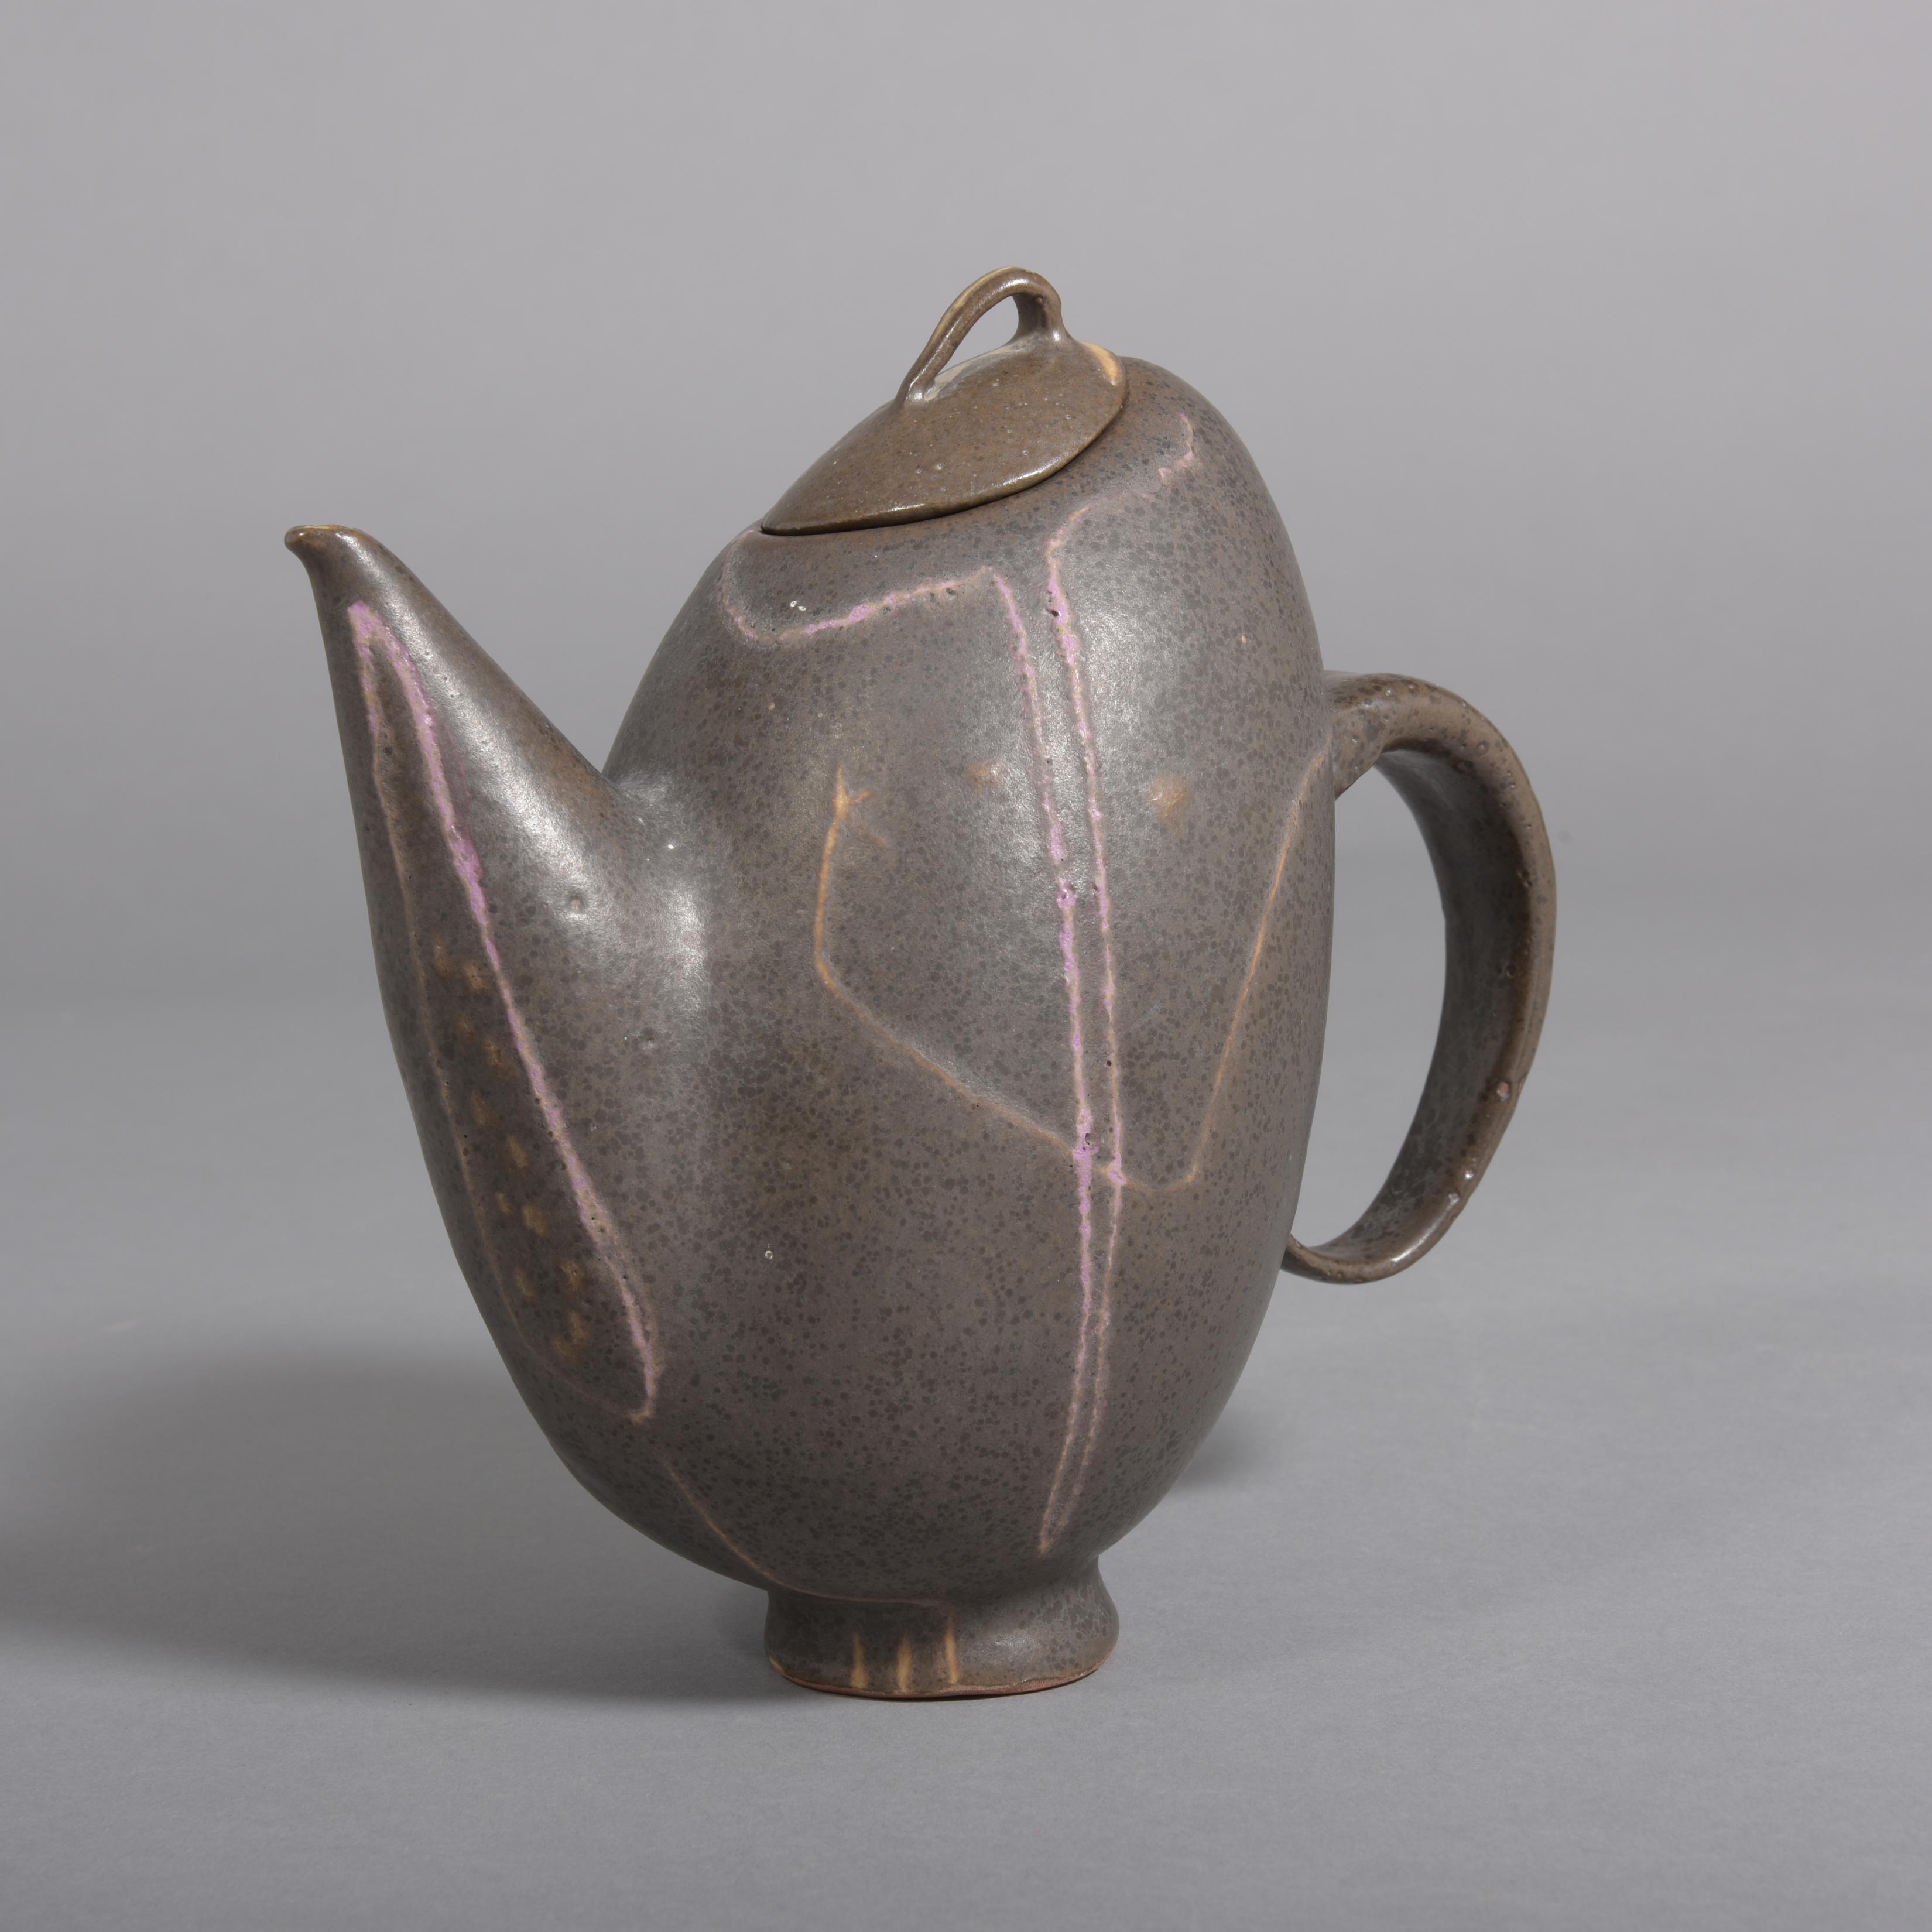 Beate Kuhn-Mokkakanne -15,6x16x8,8cm